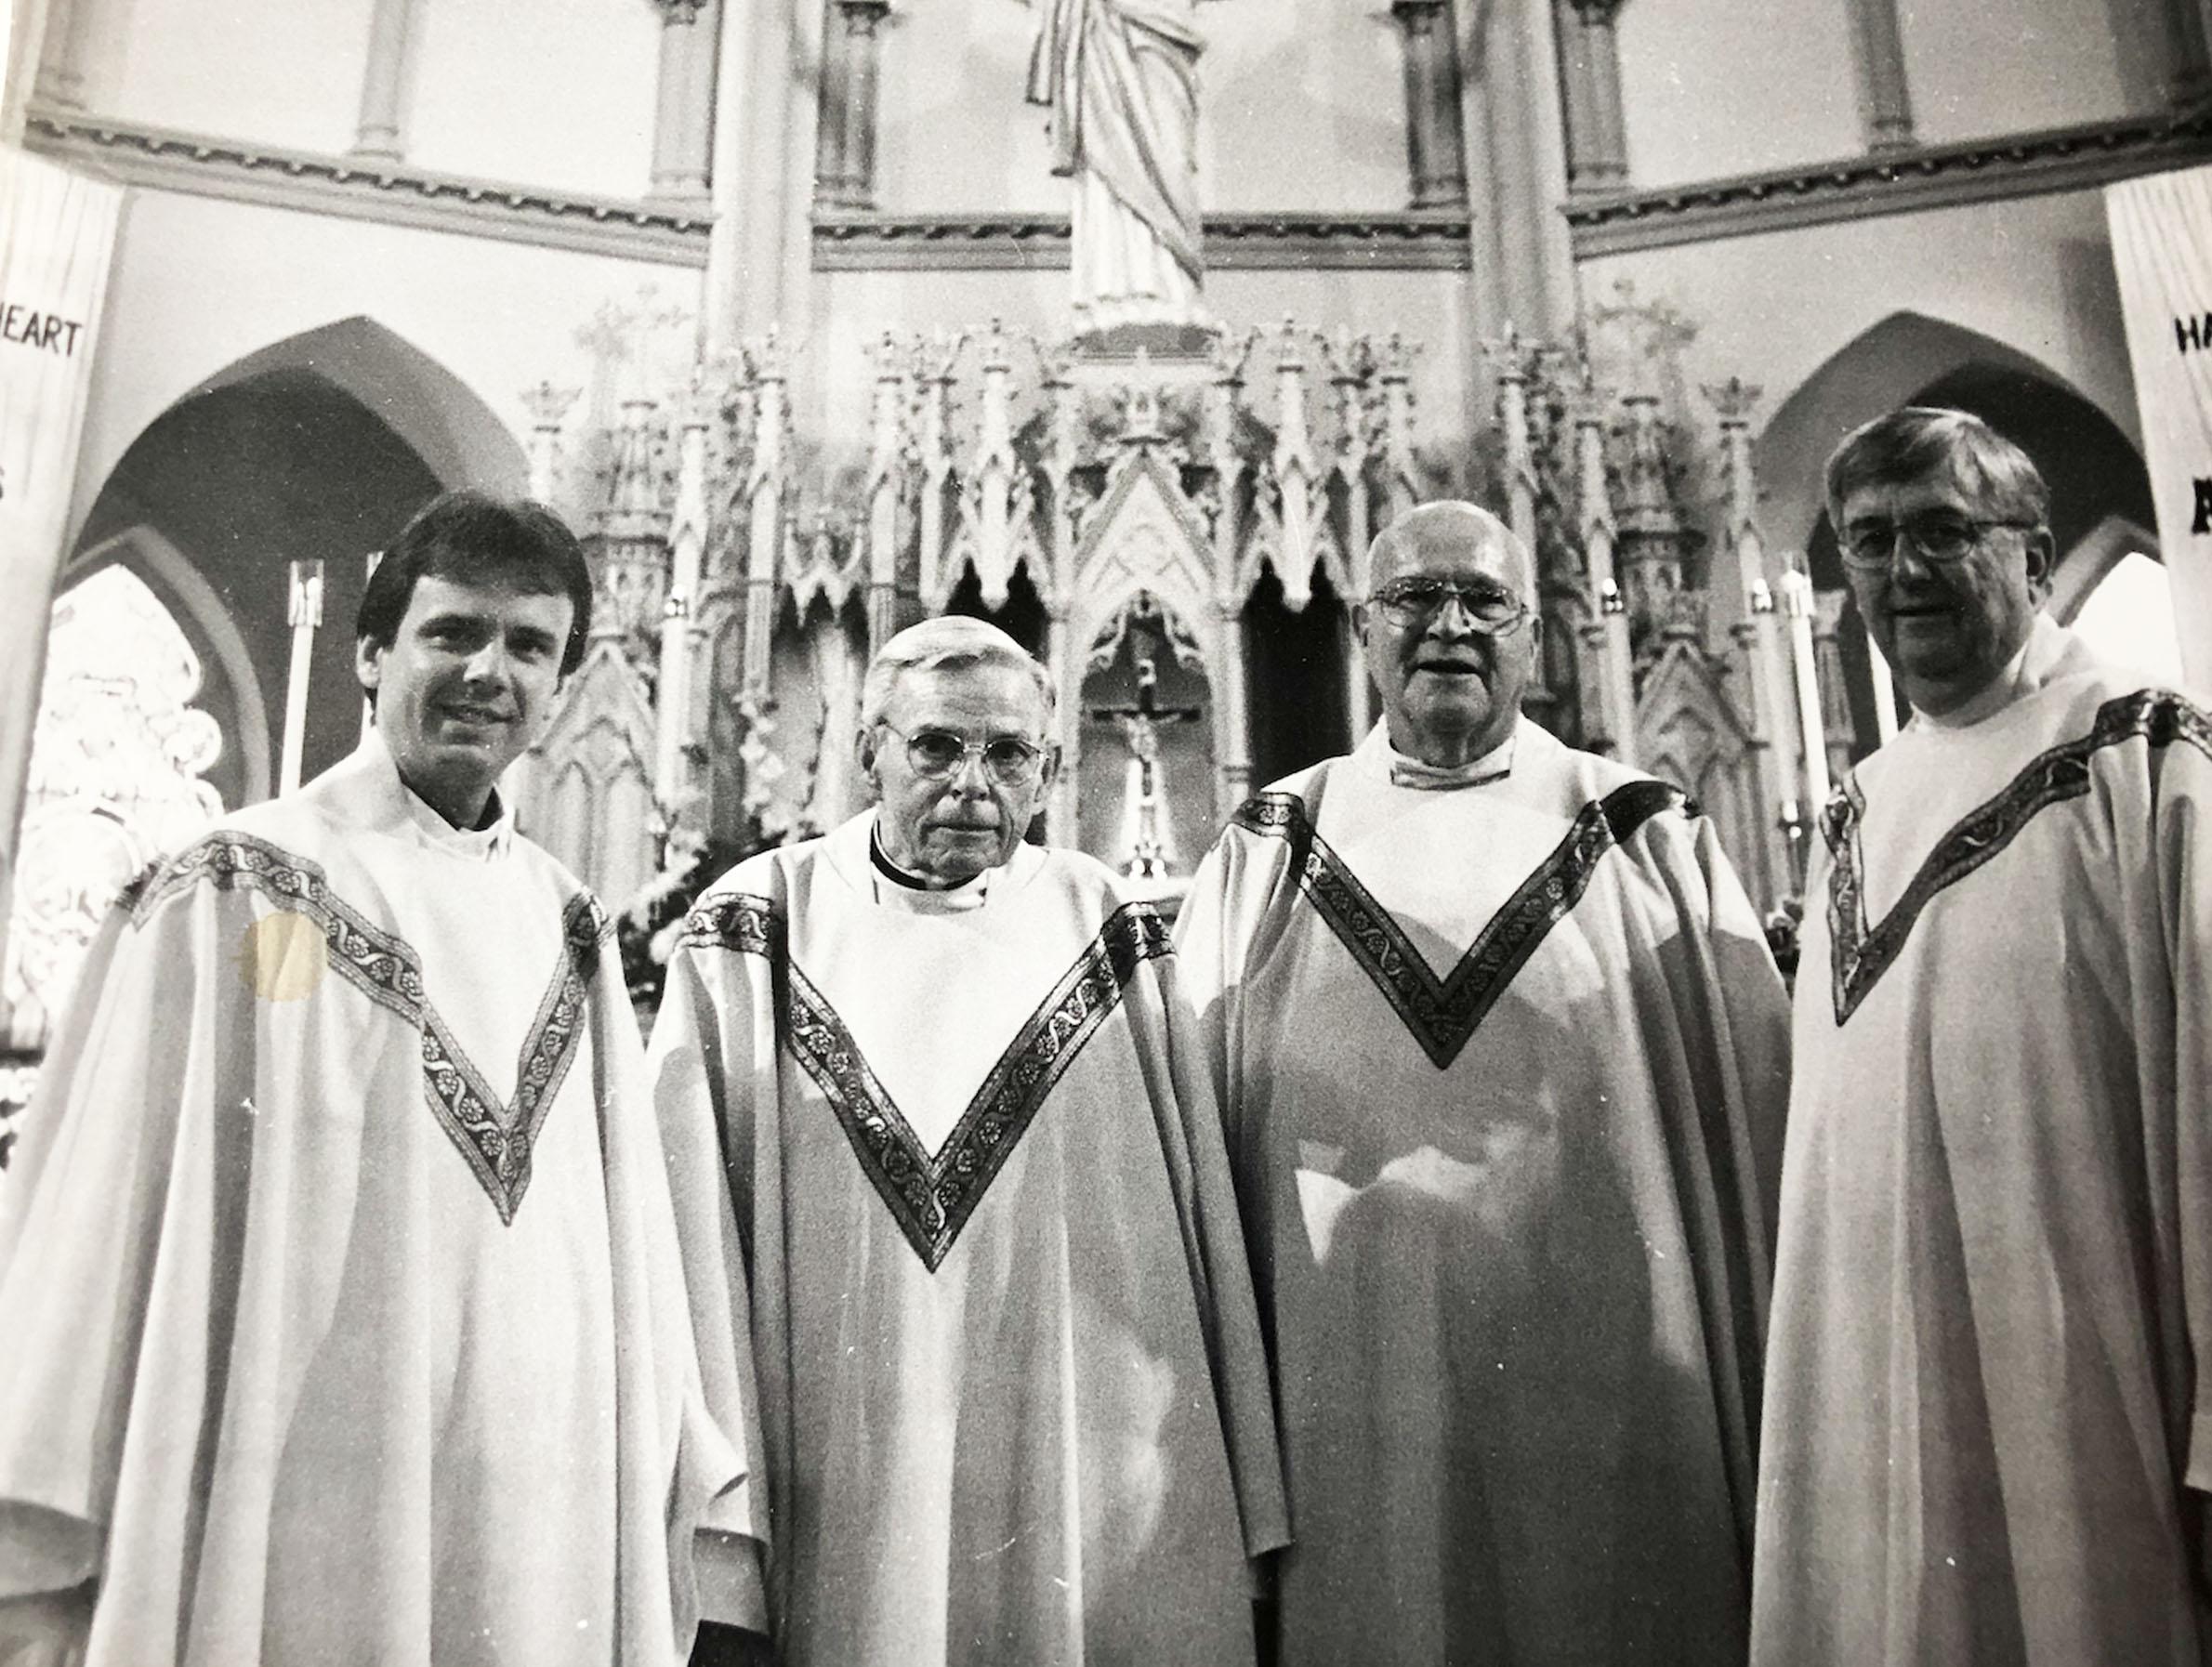 Sacred Heart's 100th Jubilee Celebration